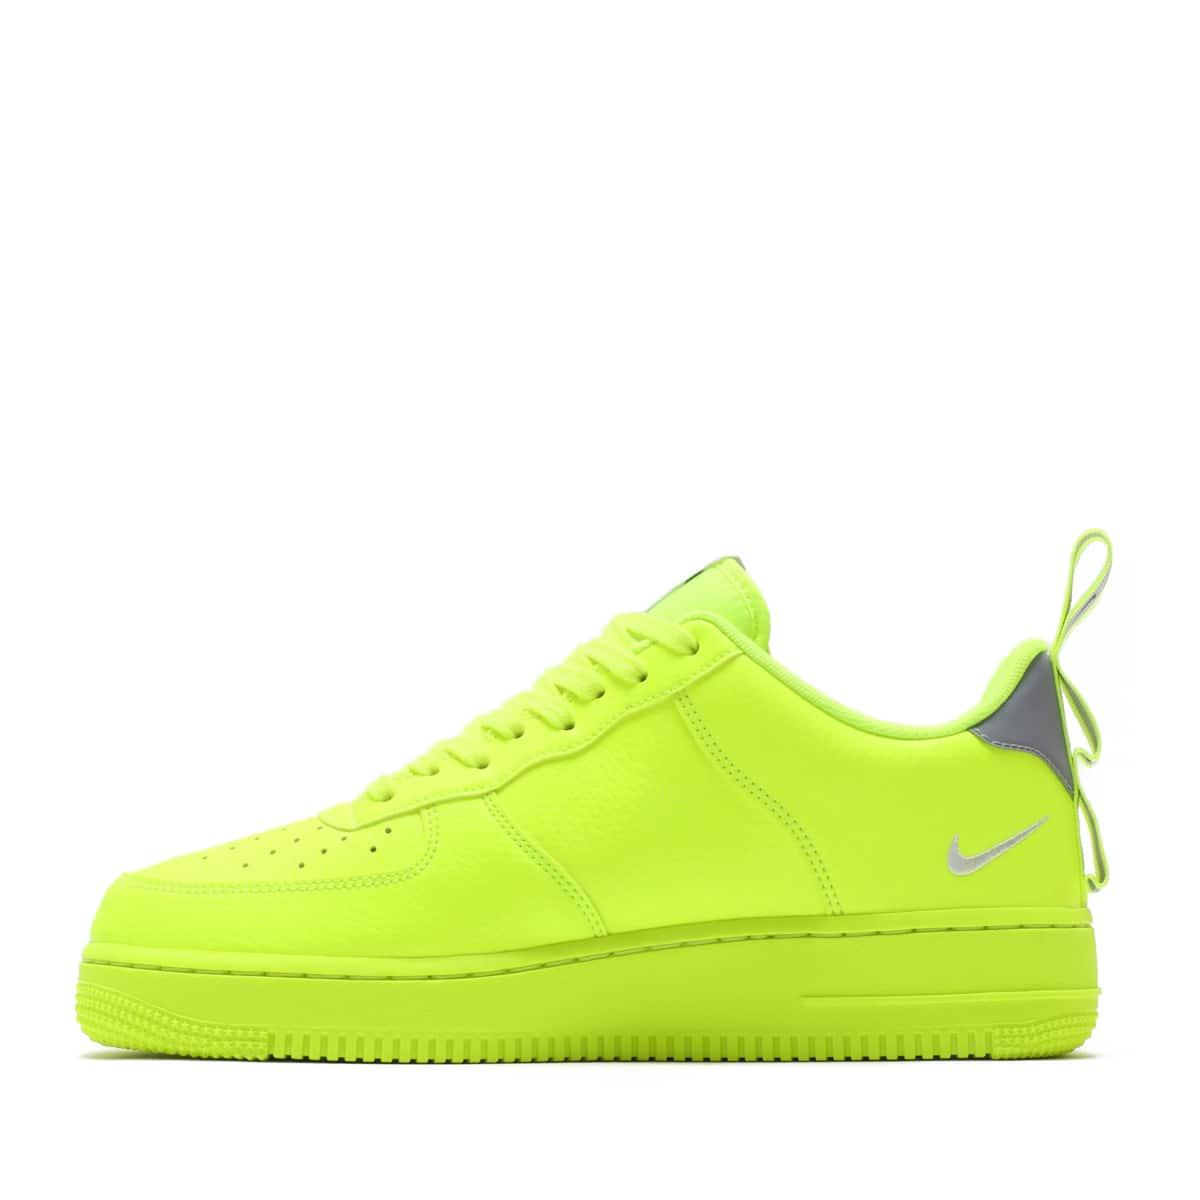 Nike Air Force 1 LV8 Utility Club   43einhalb Sneaker Store